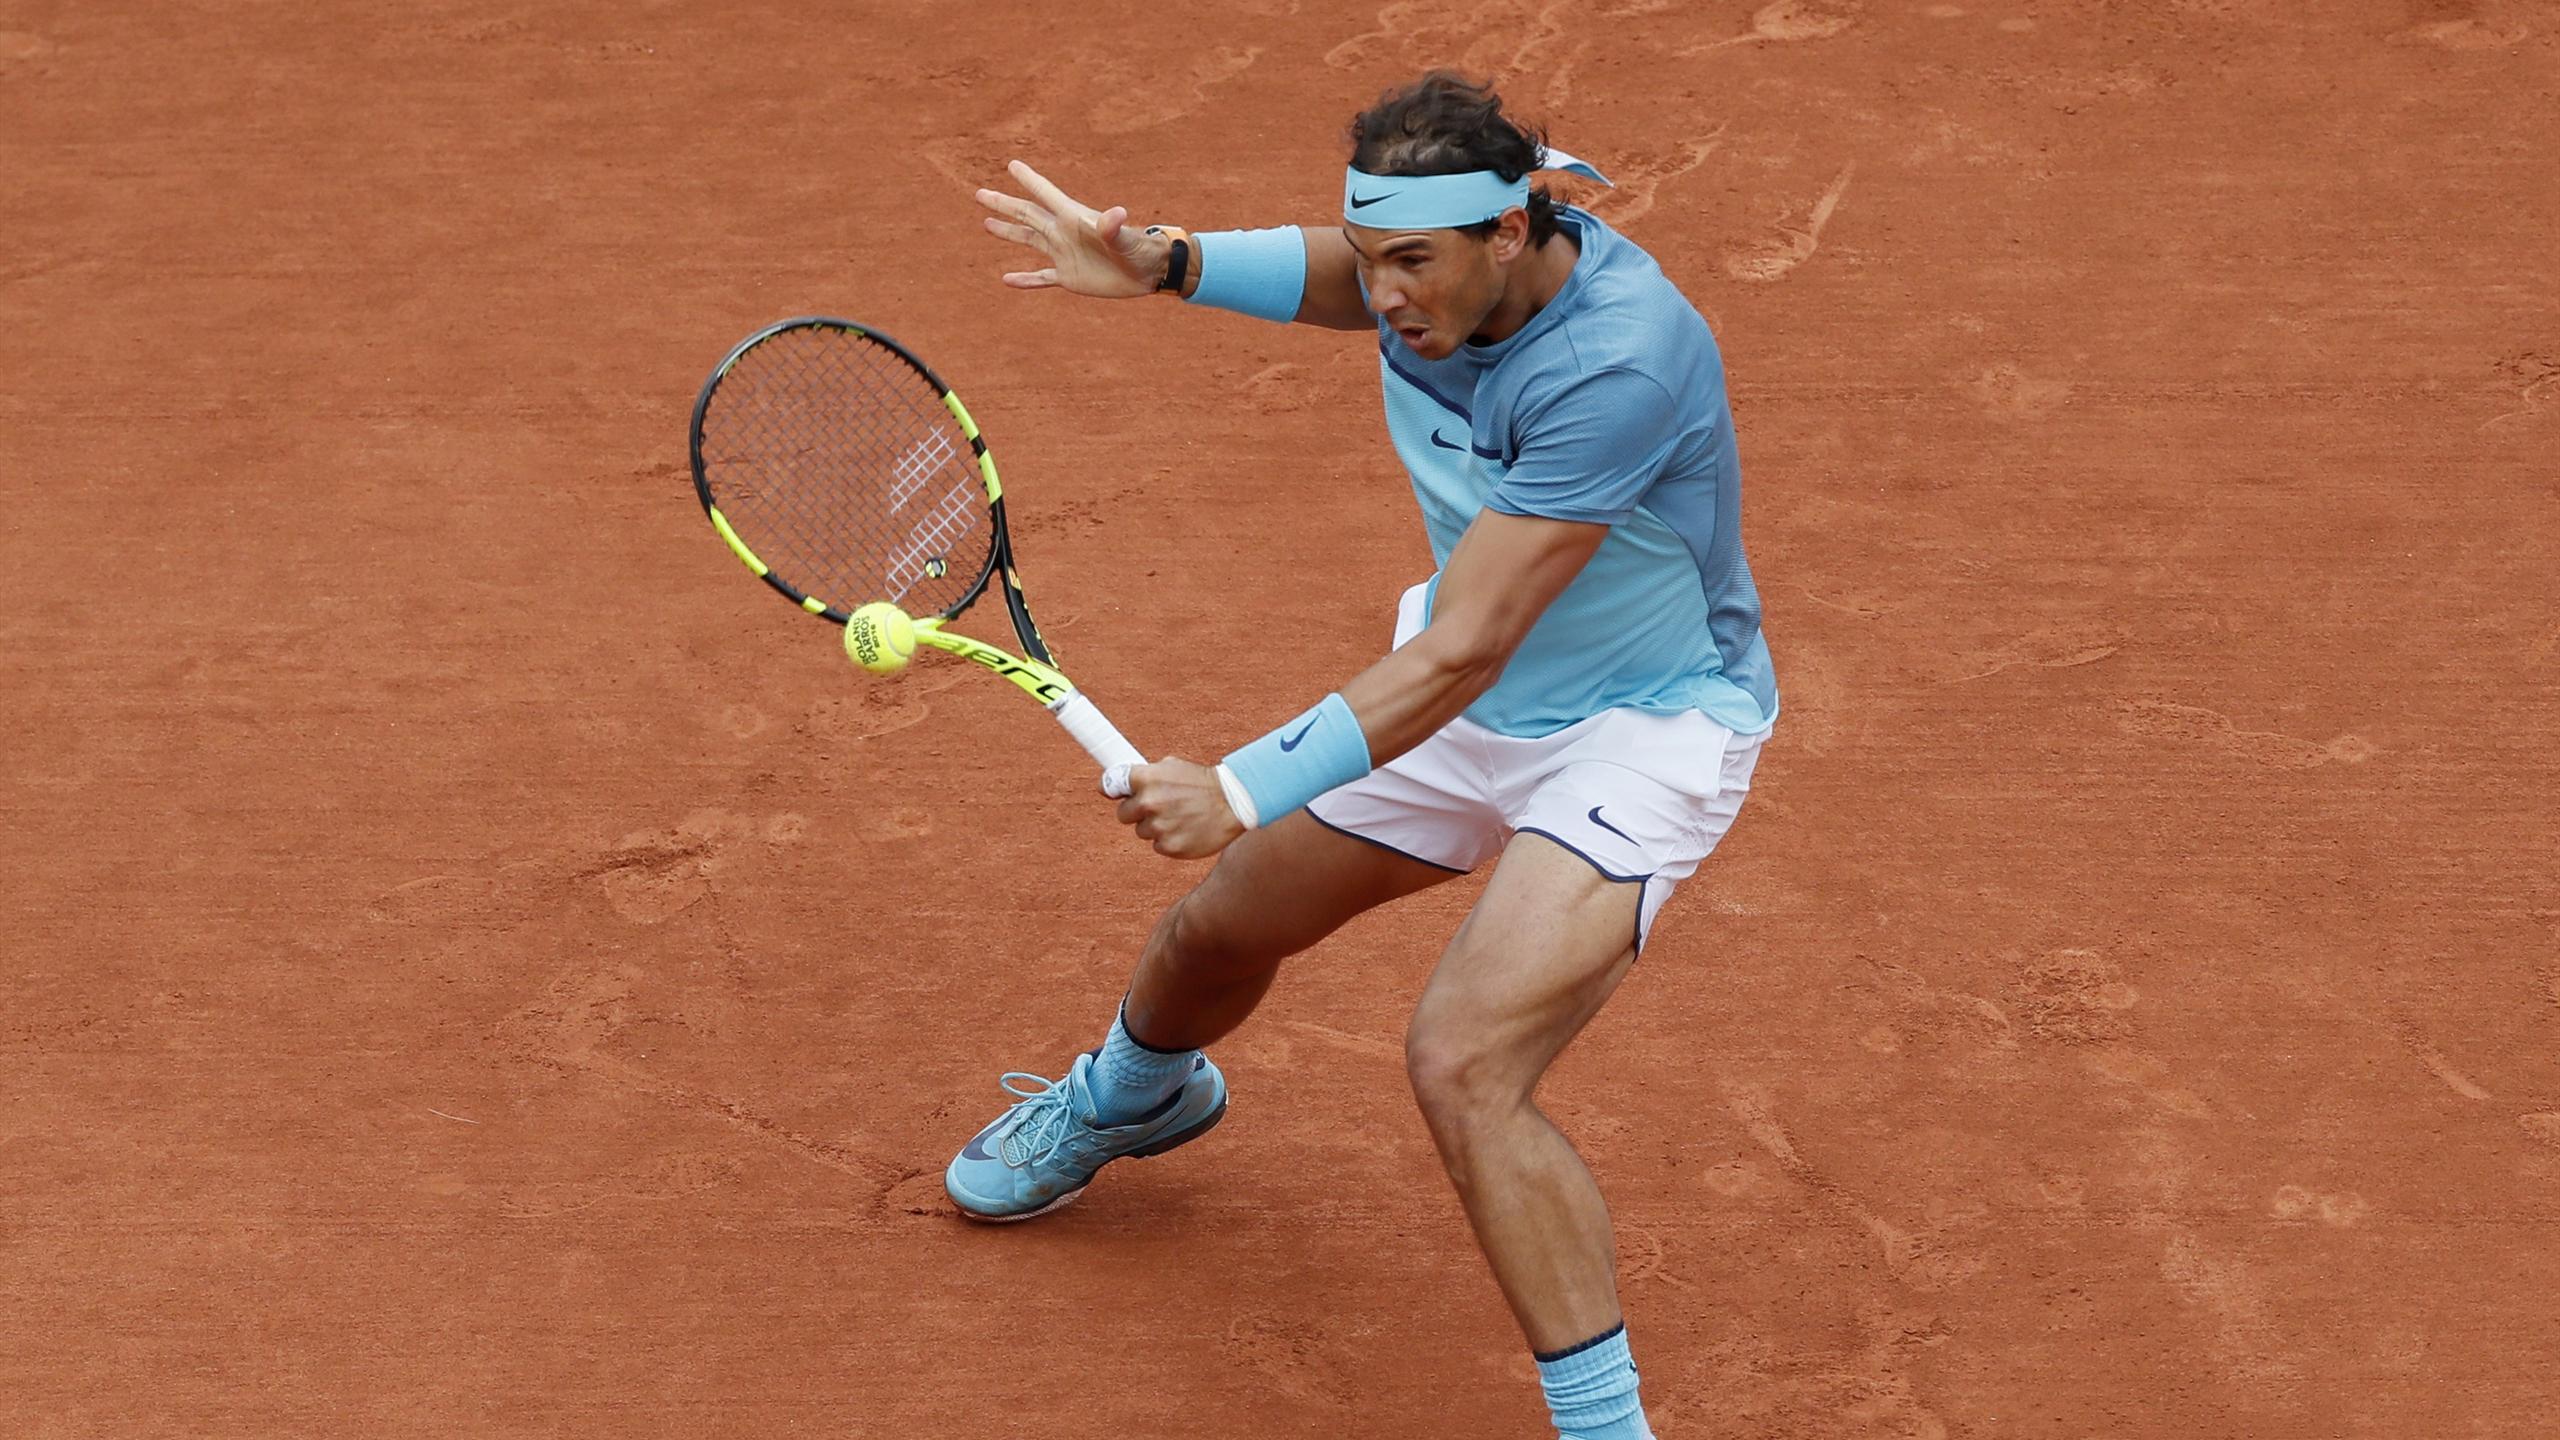 Tennis - French Open - Roland Garros - Rafael Nadal of Spain vs Sam Groth of Australia - Paris, France - 24/05/16.